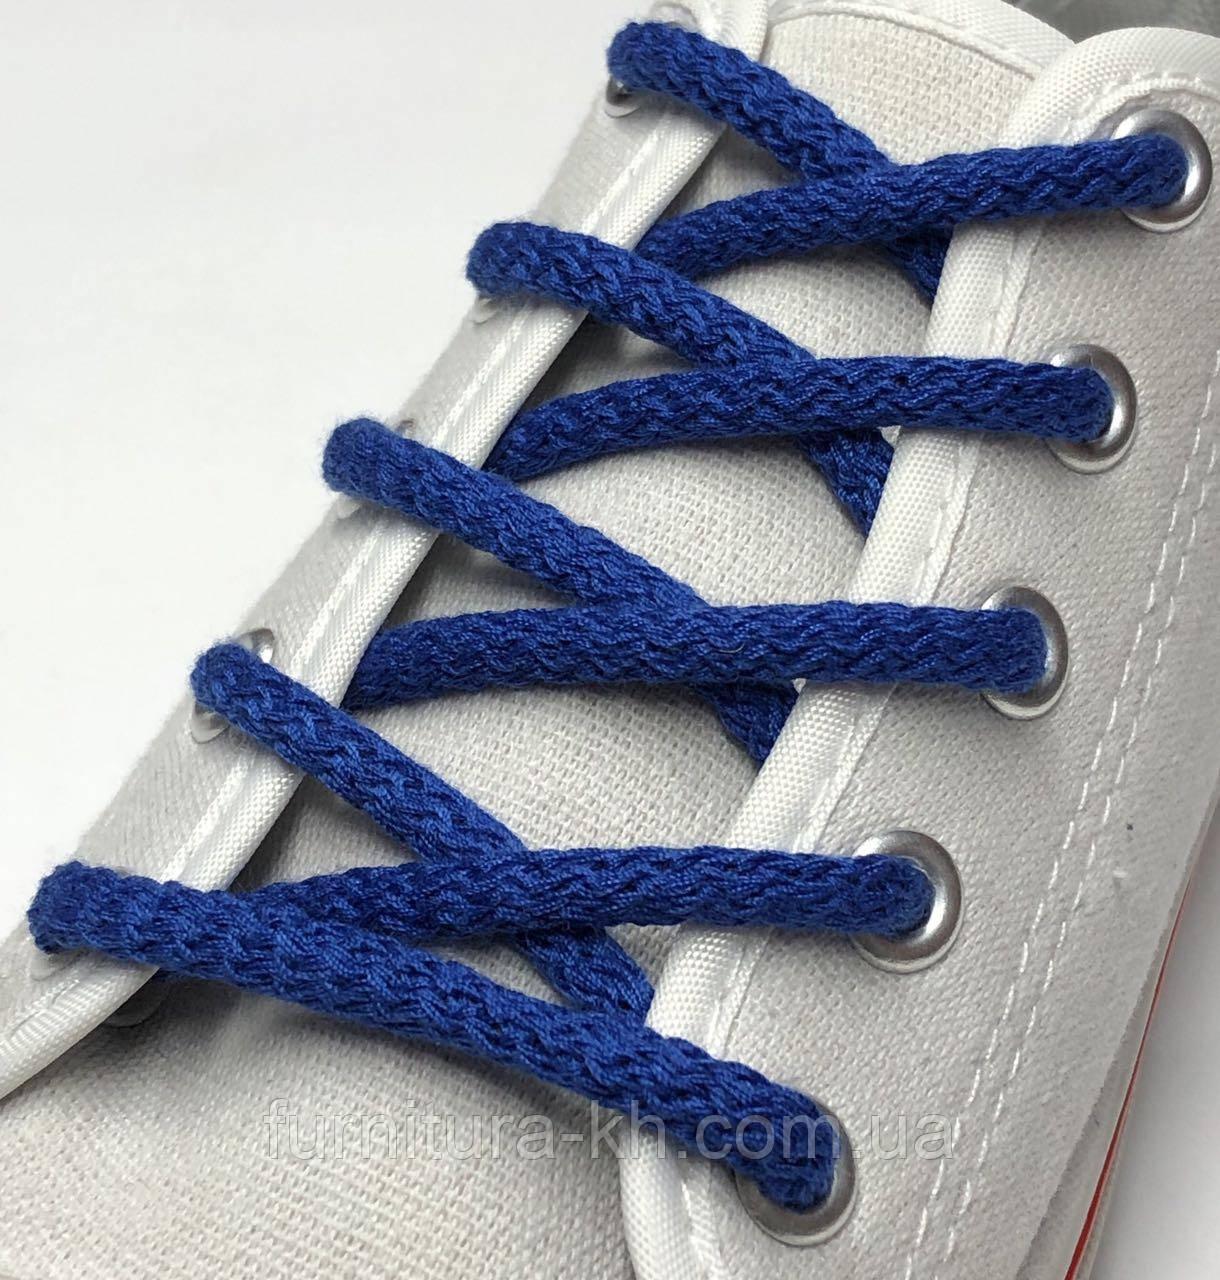 Шнурок Простой Круглый.Длинна 1,2 метр цвет Электрик (толщина 5 мм)